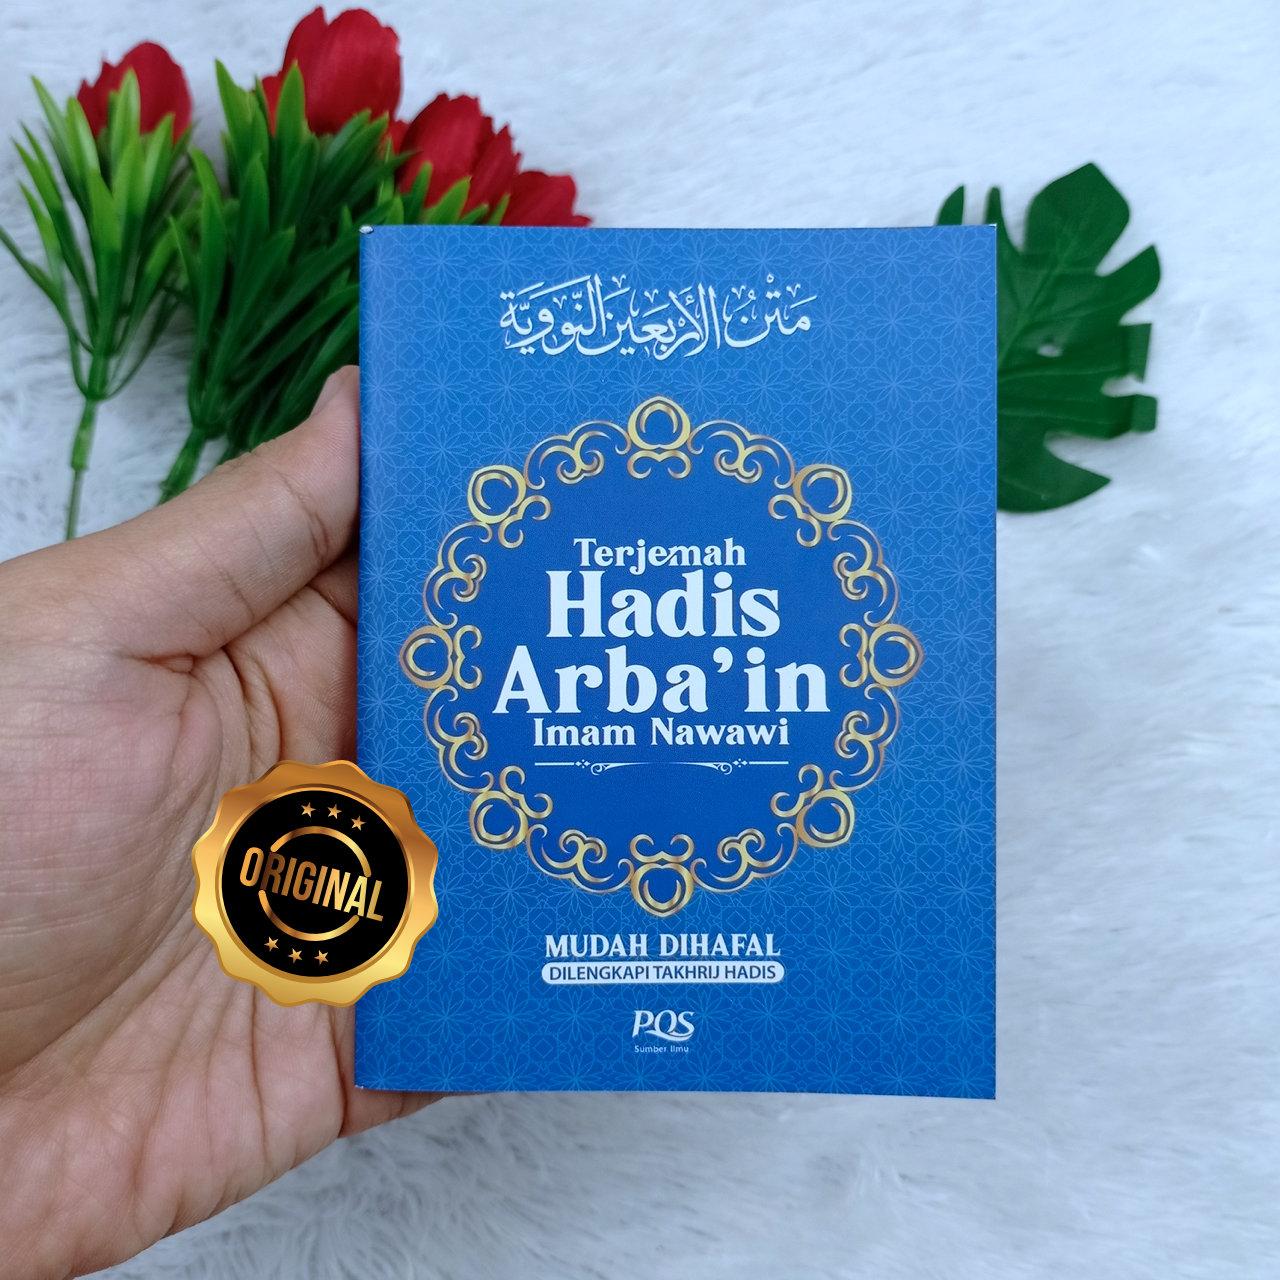 Buku Saku Terjemah Hadis Arba'in Imam Nawawi Mudah Dihafal